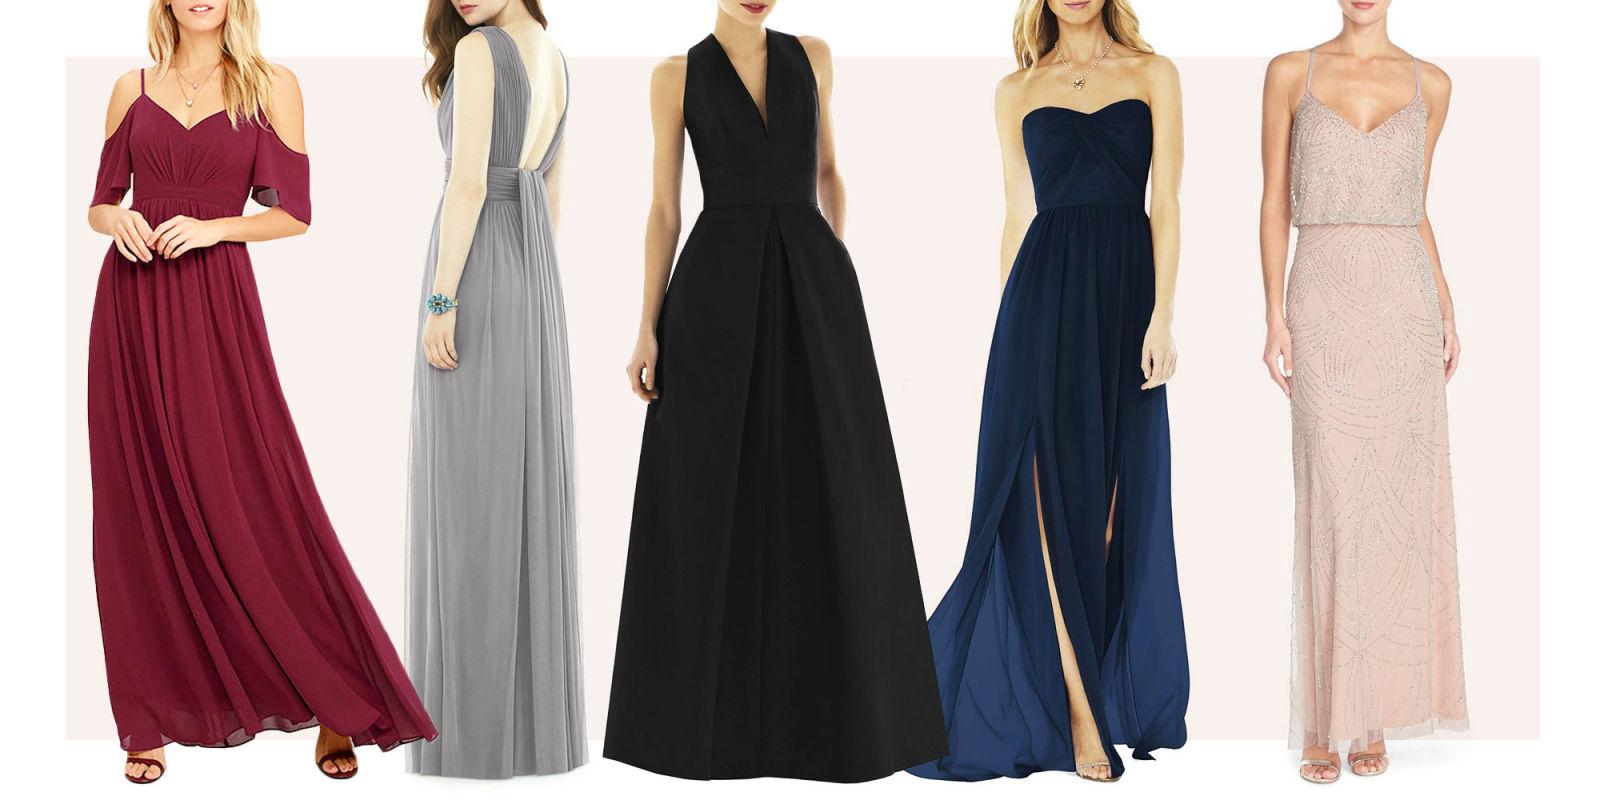 15 best bridesmaids dresses for 2017 beautiful winter bridesmaid 15 best bridesmaids dresses for 2017 beautiful winter bridesmaid dress ideas ombrellifo Gallery